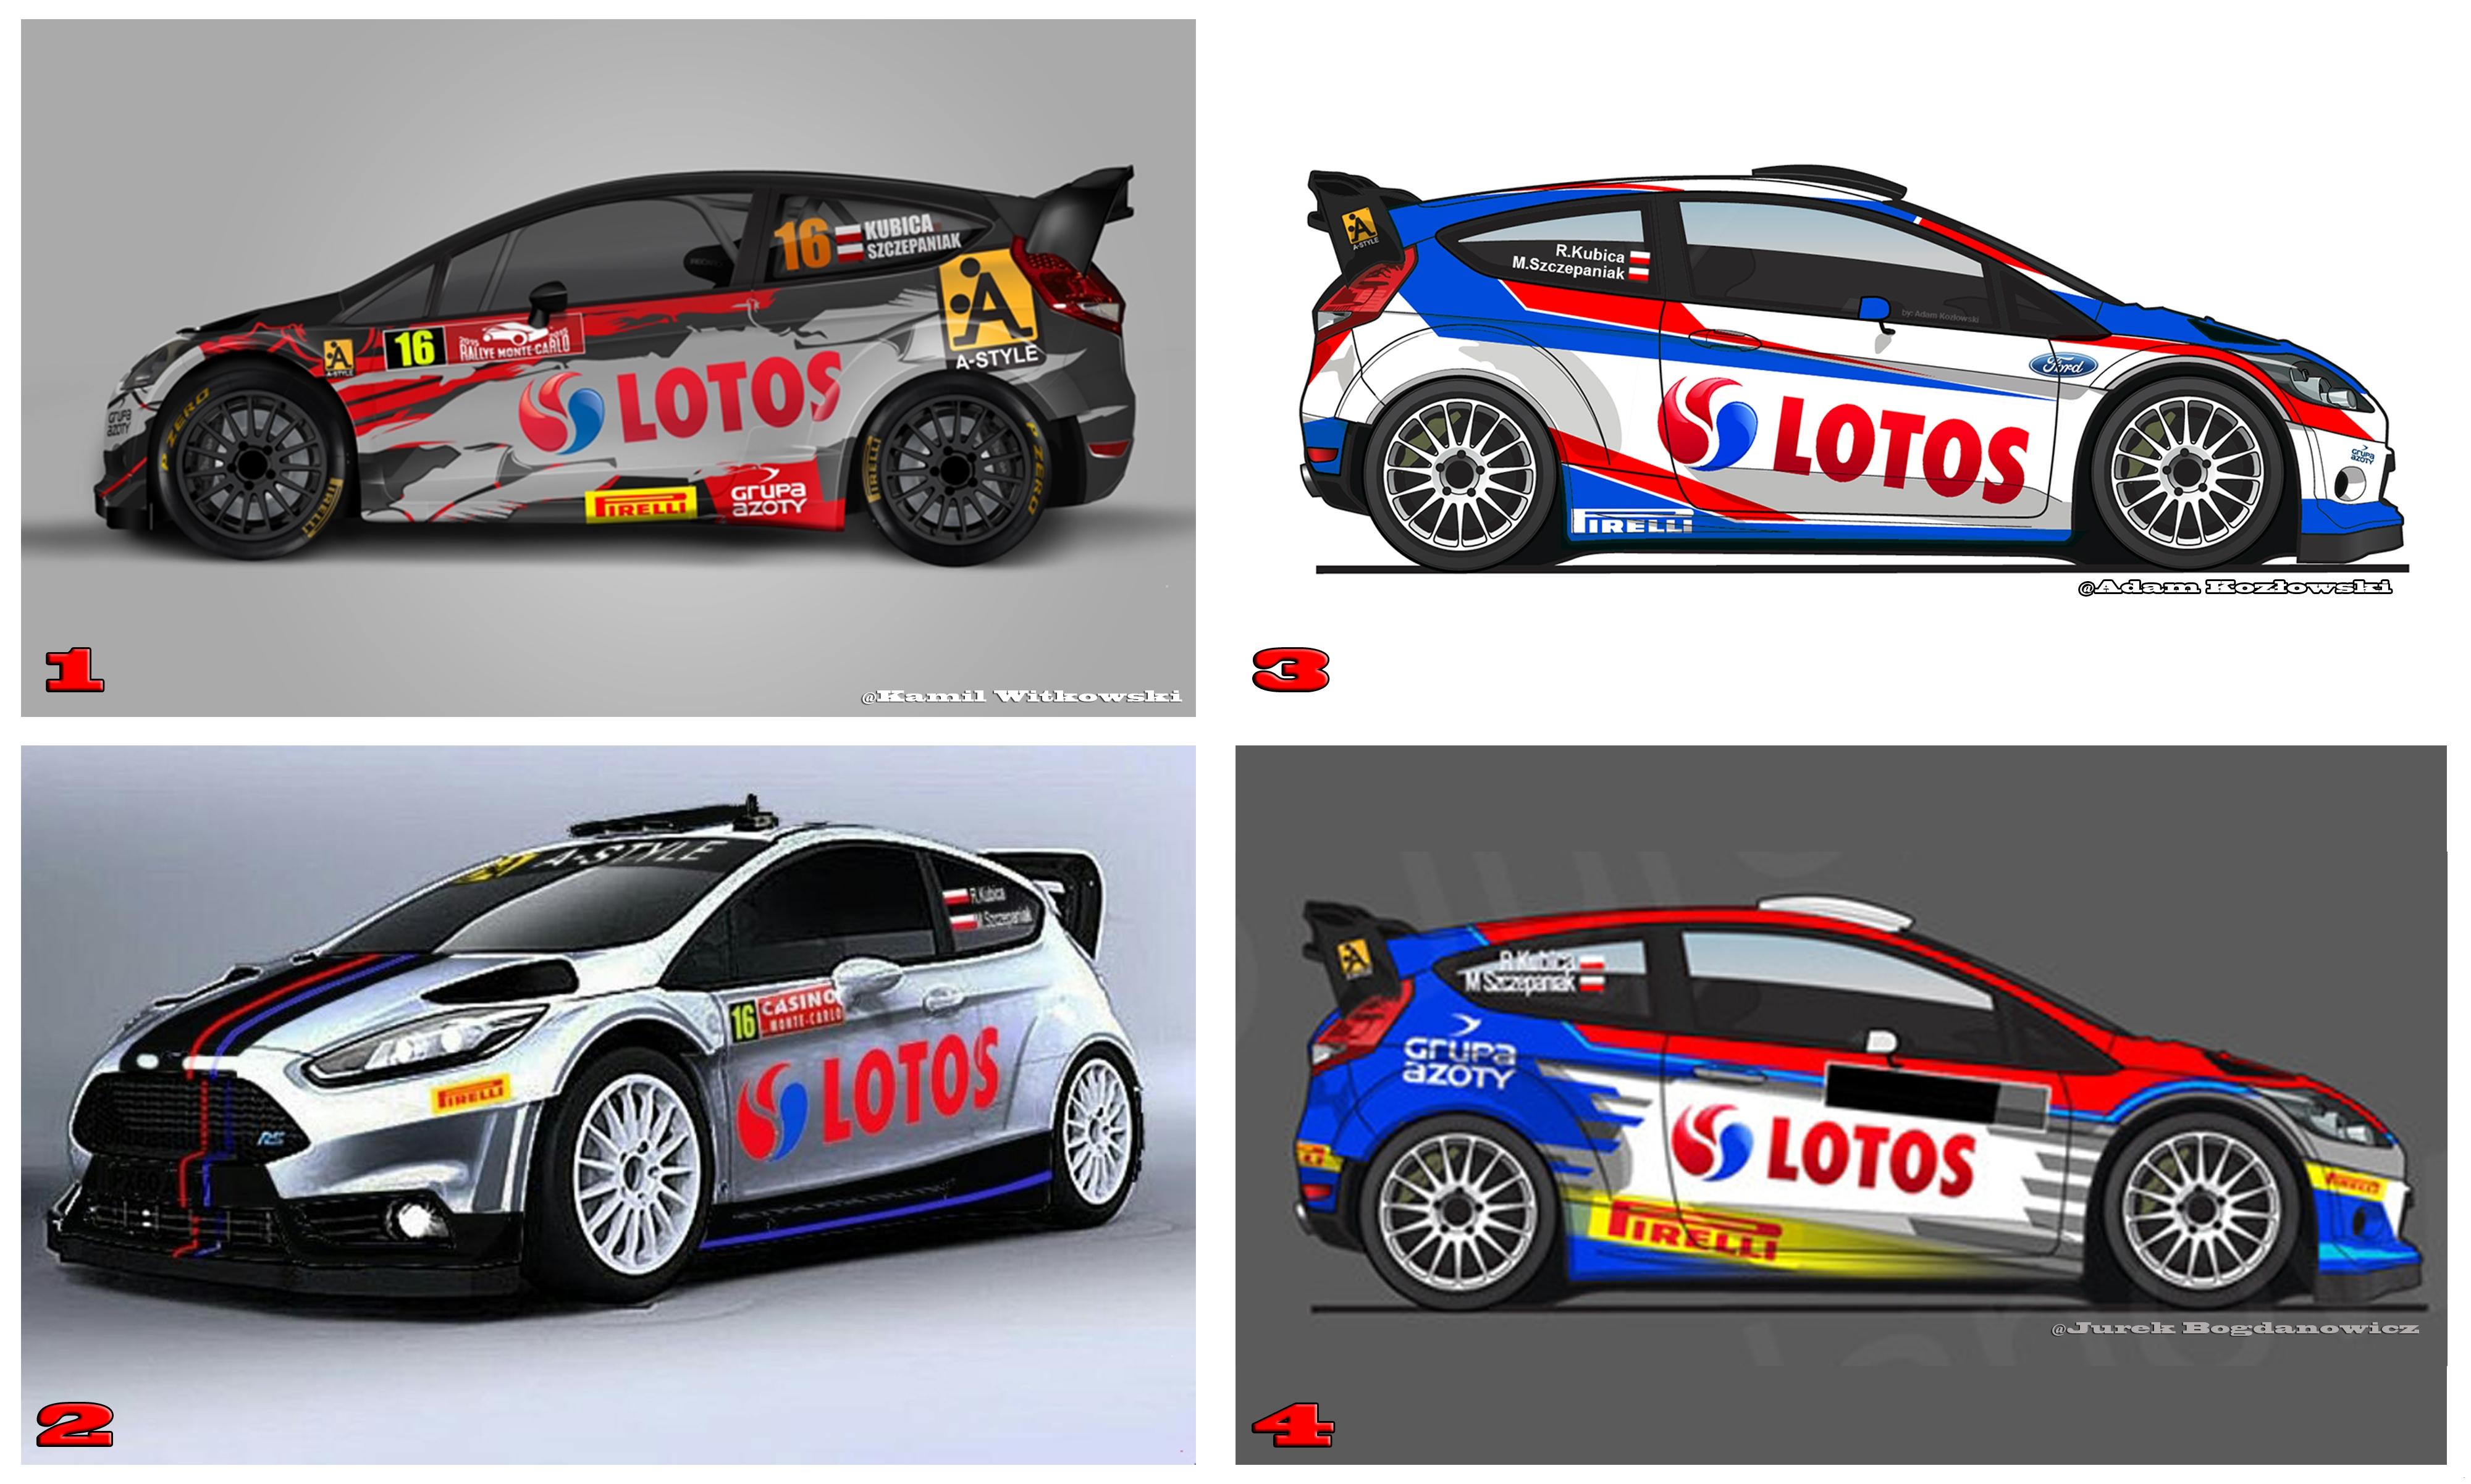 Robert Kubica - Malowanie Ford Fiesta WRC A-Style Pirelli